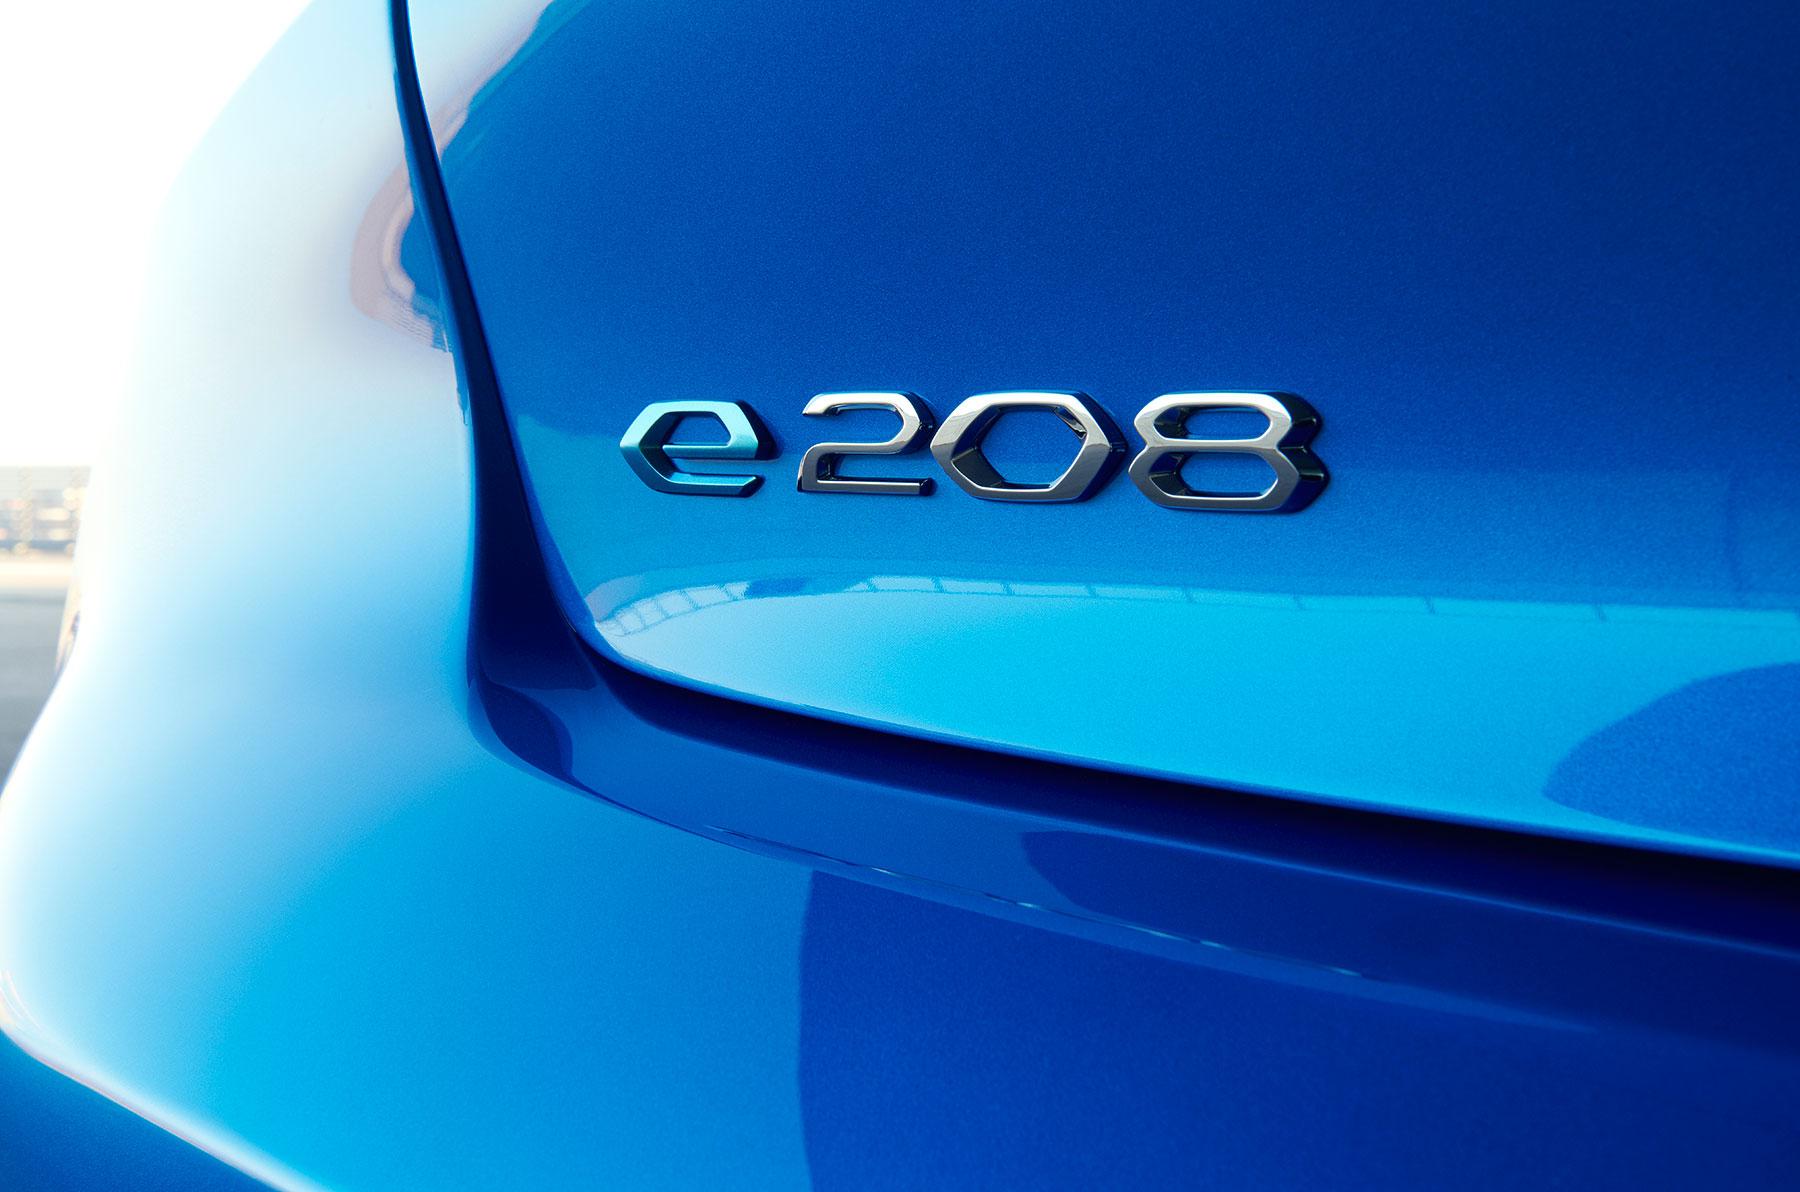 Peugeot e-208: bestellbar ab 30.450 Euro